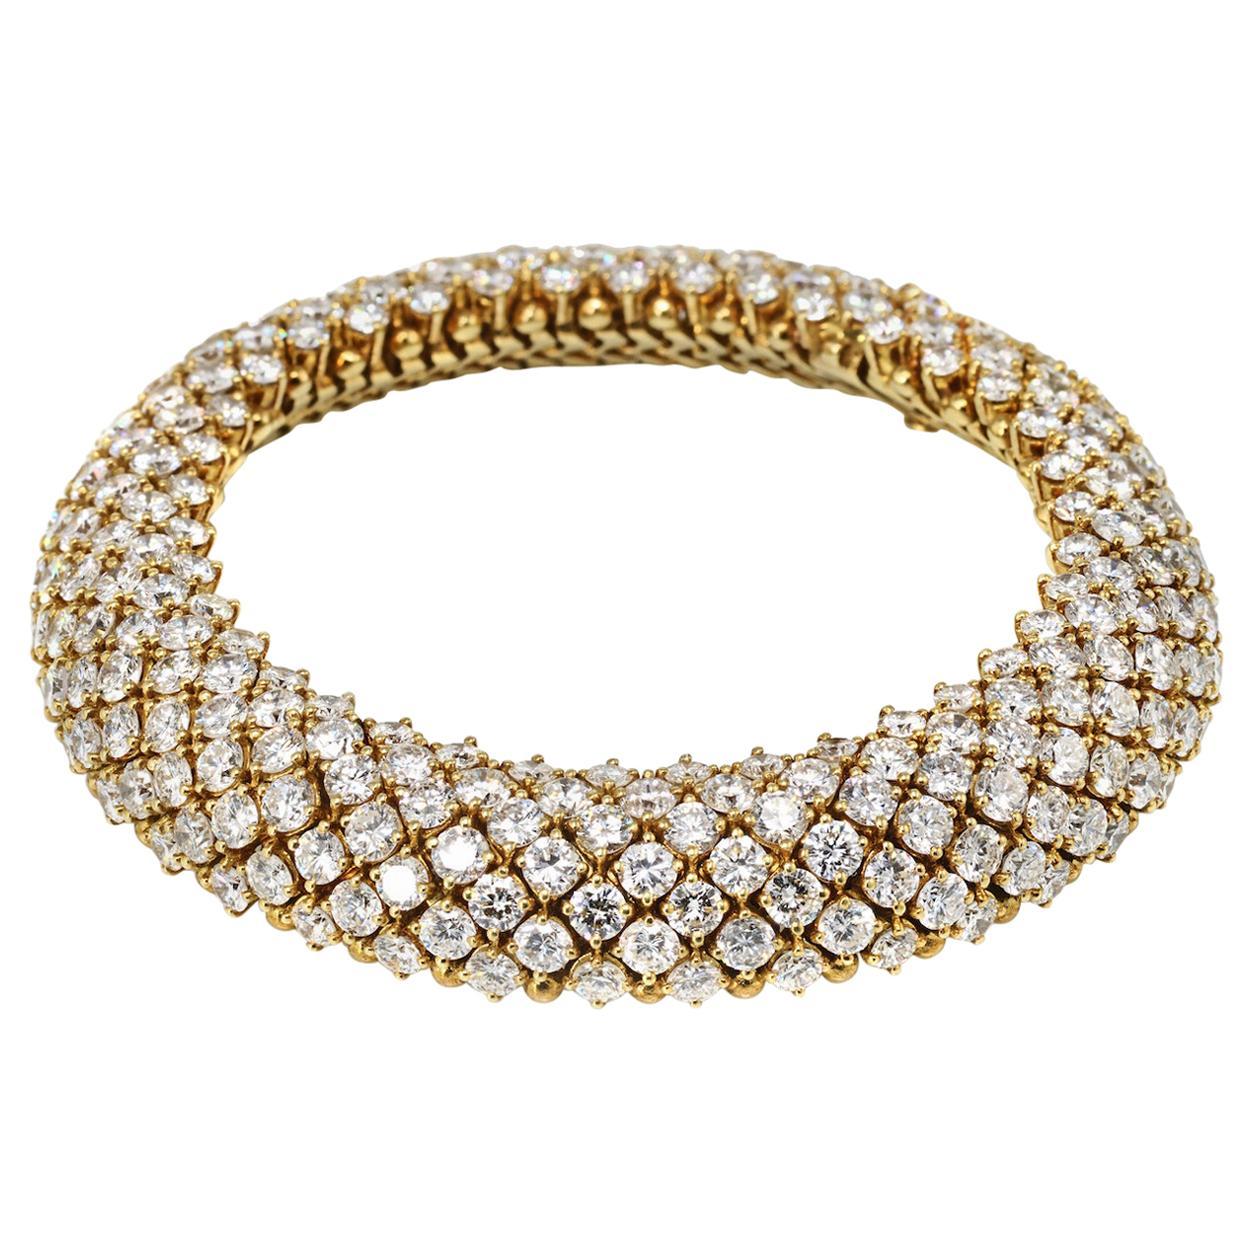 Van Cleef & Arpels 40.00 Carat Diamond Multi Row 18 Karat Gold Bracelet